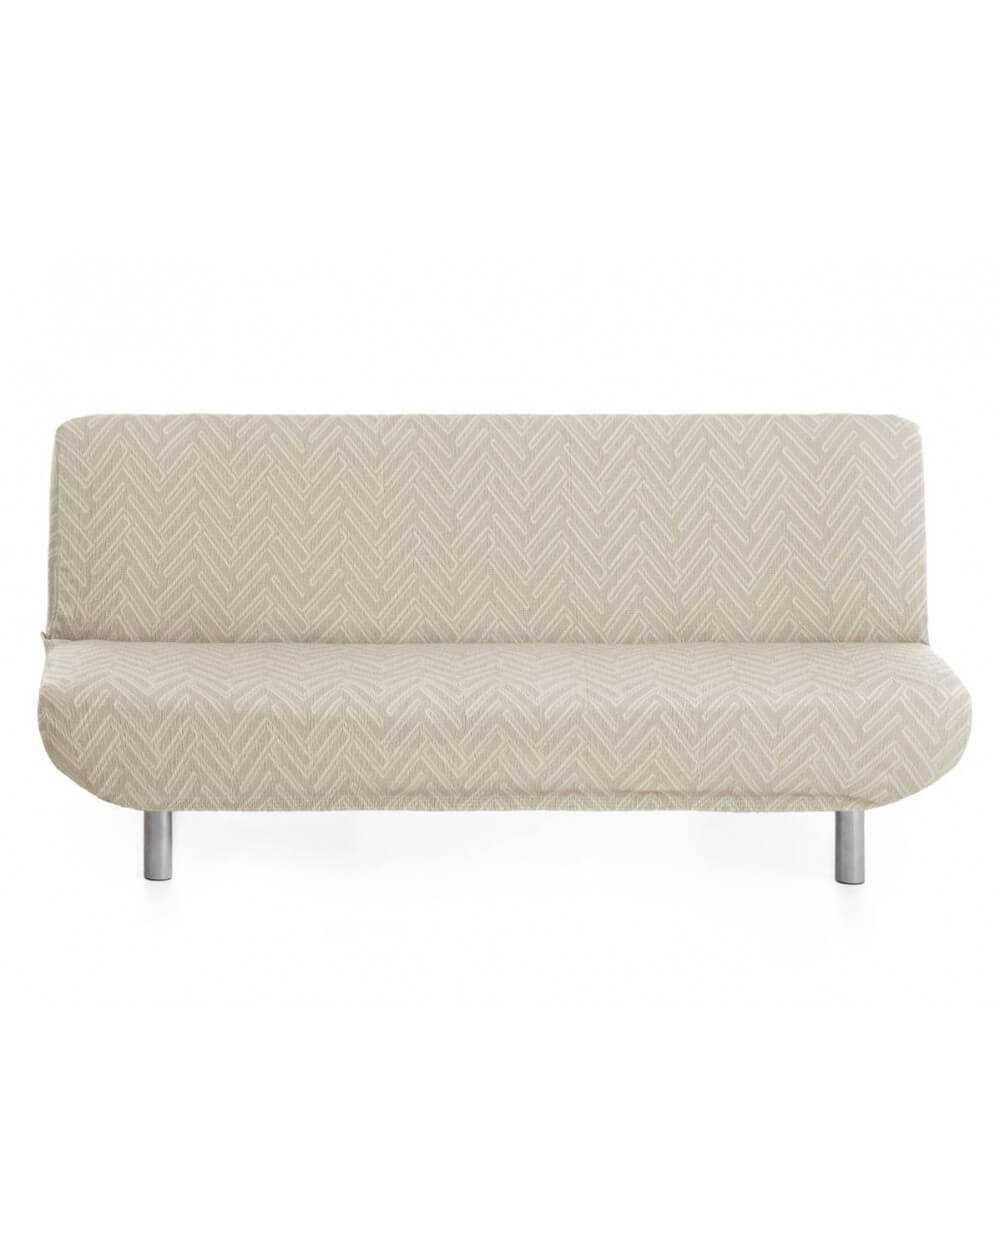 Funda sofá Clic Clac ARGOS de Eysa